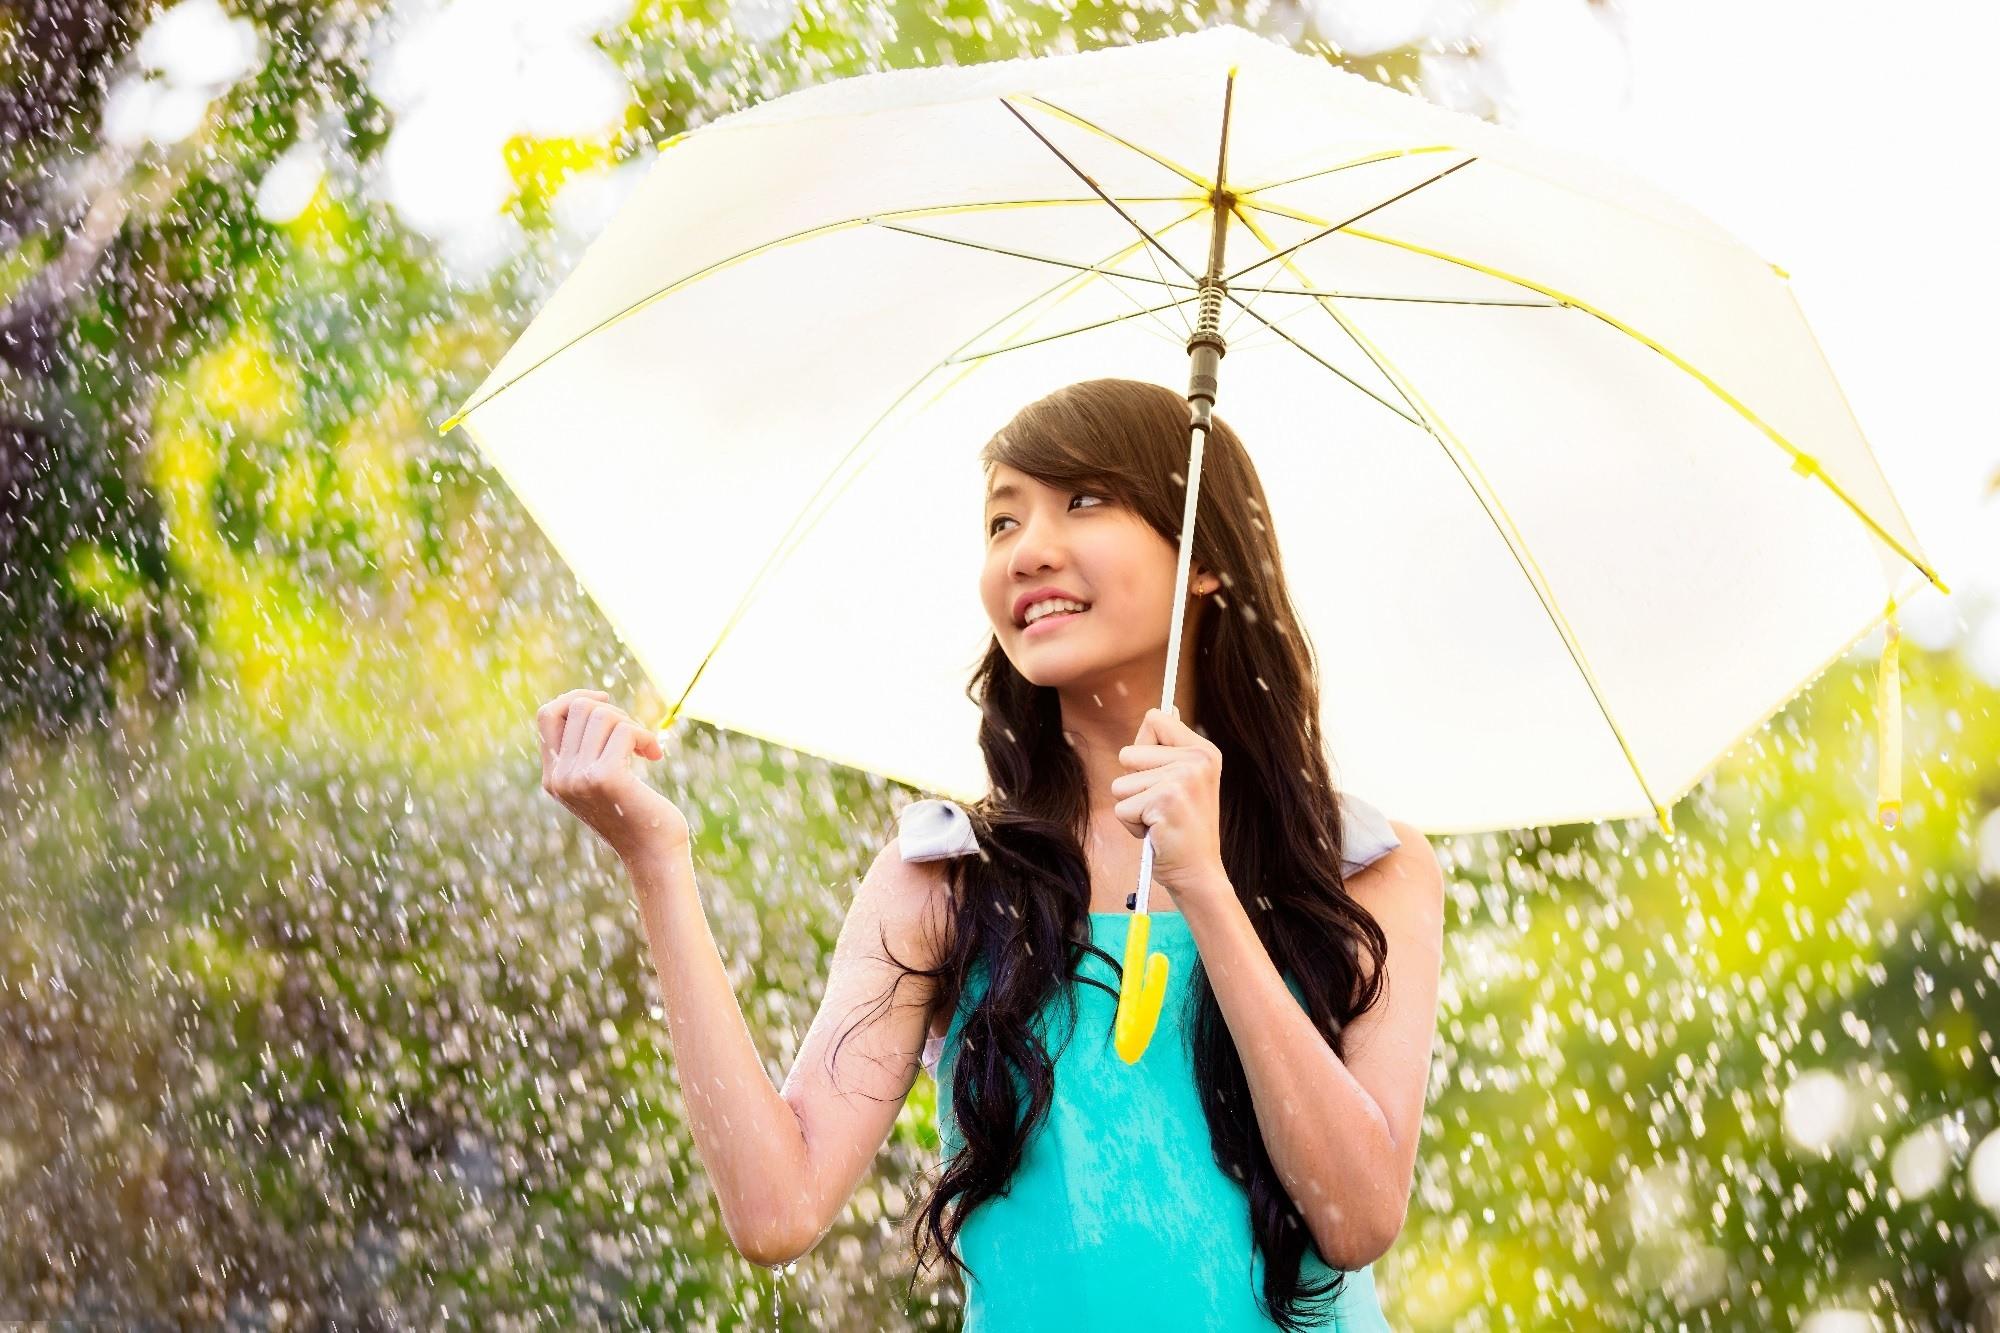 Rainy day hair care tips